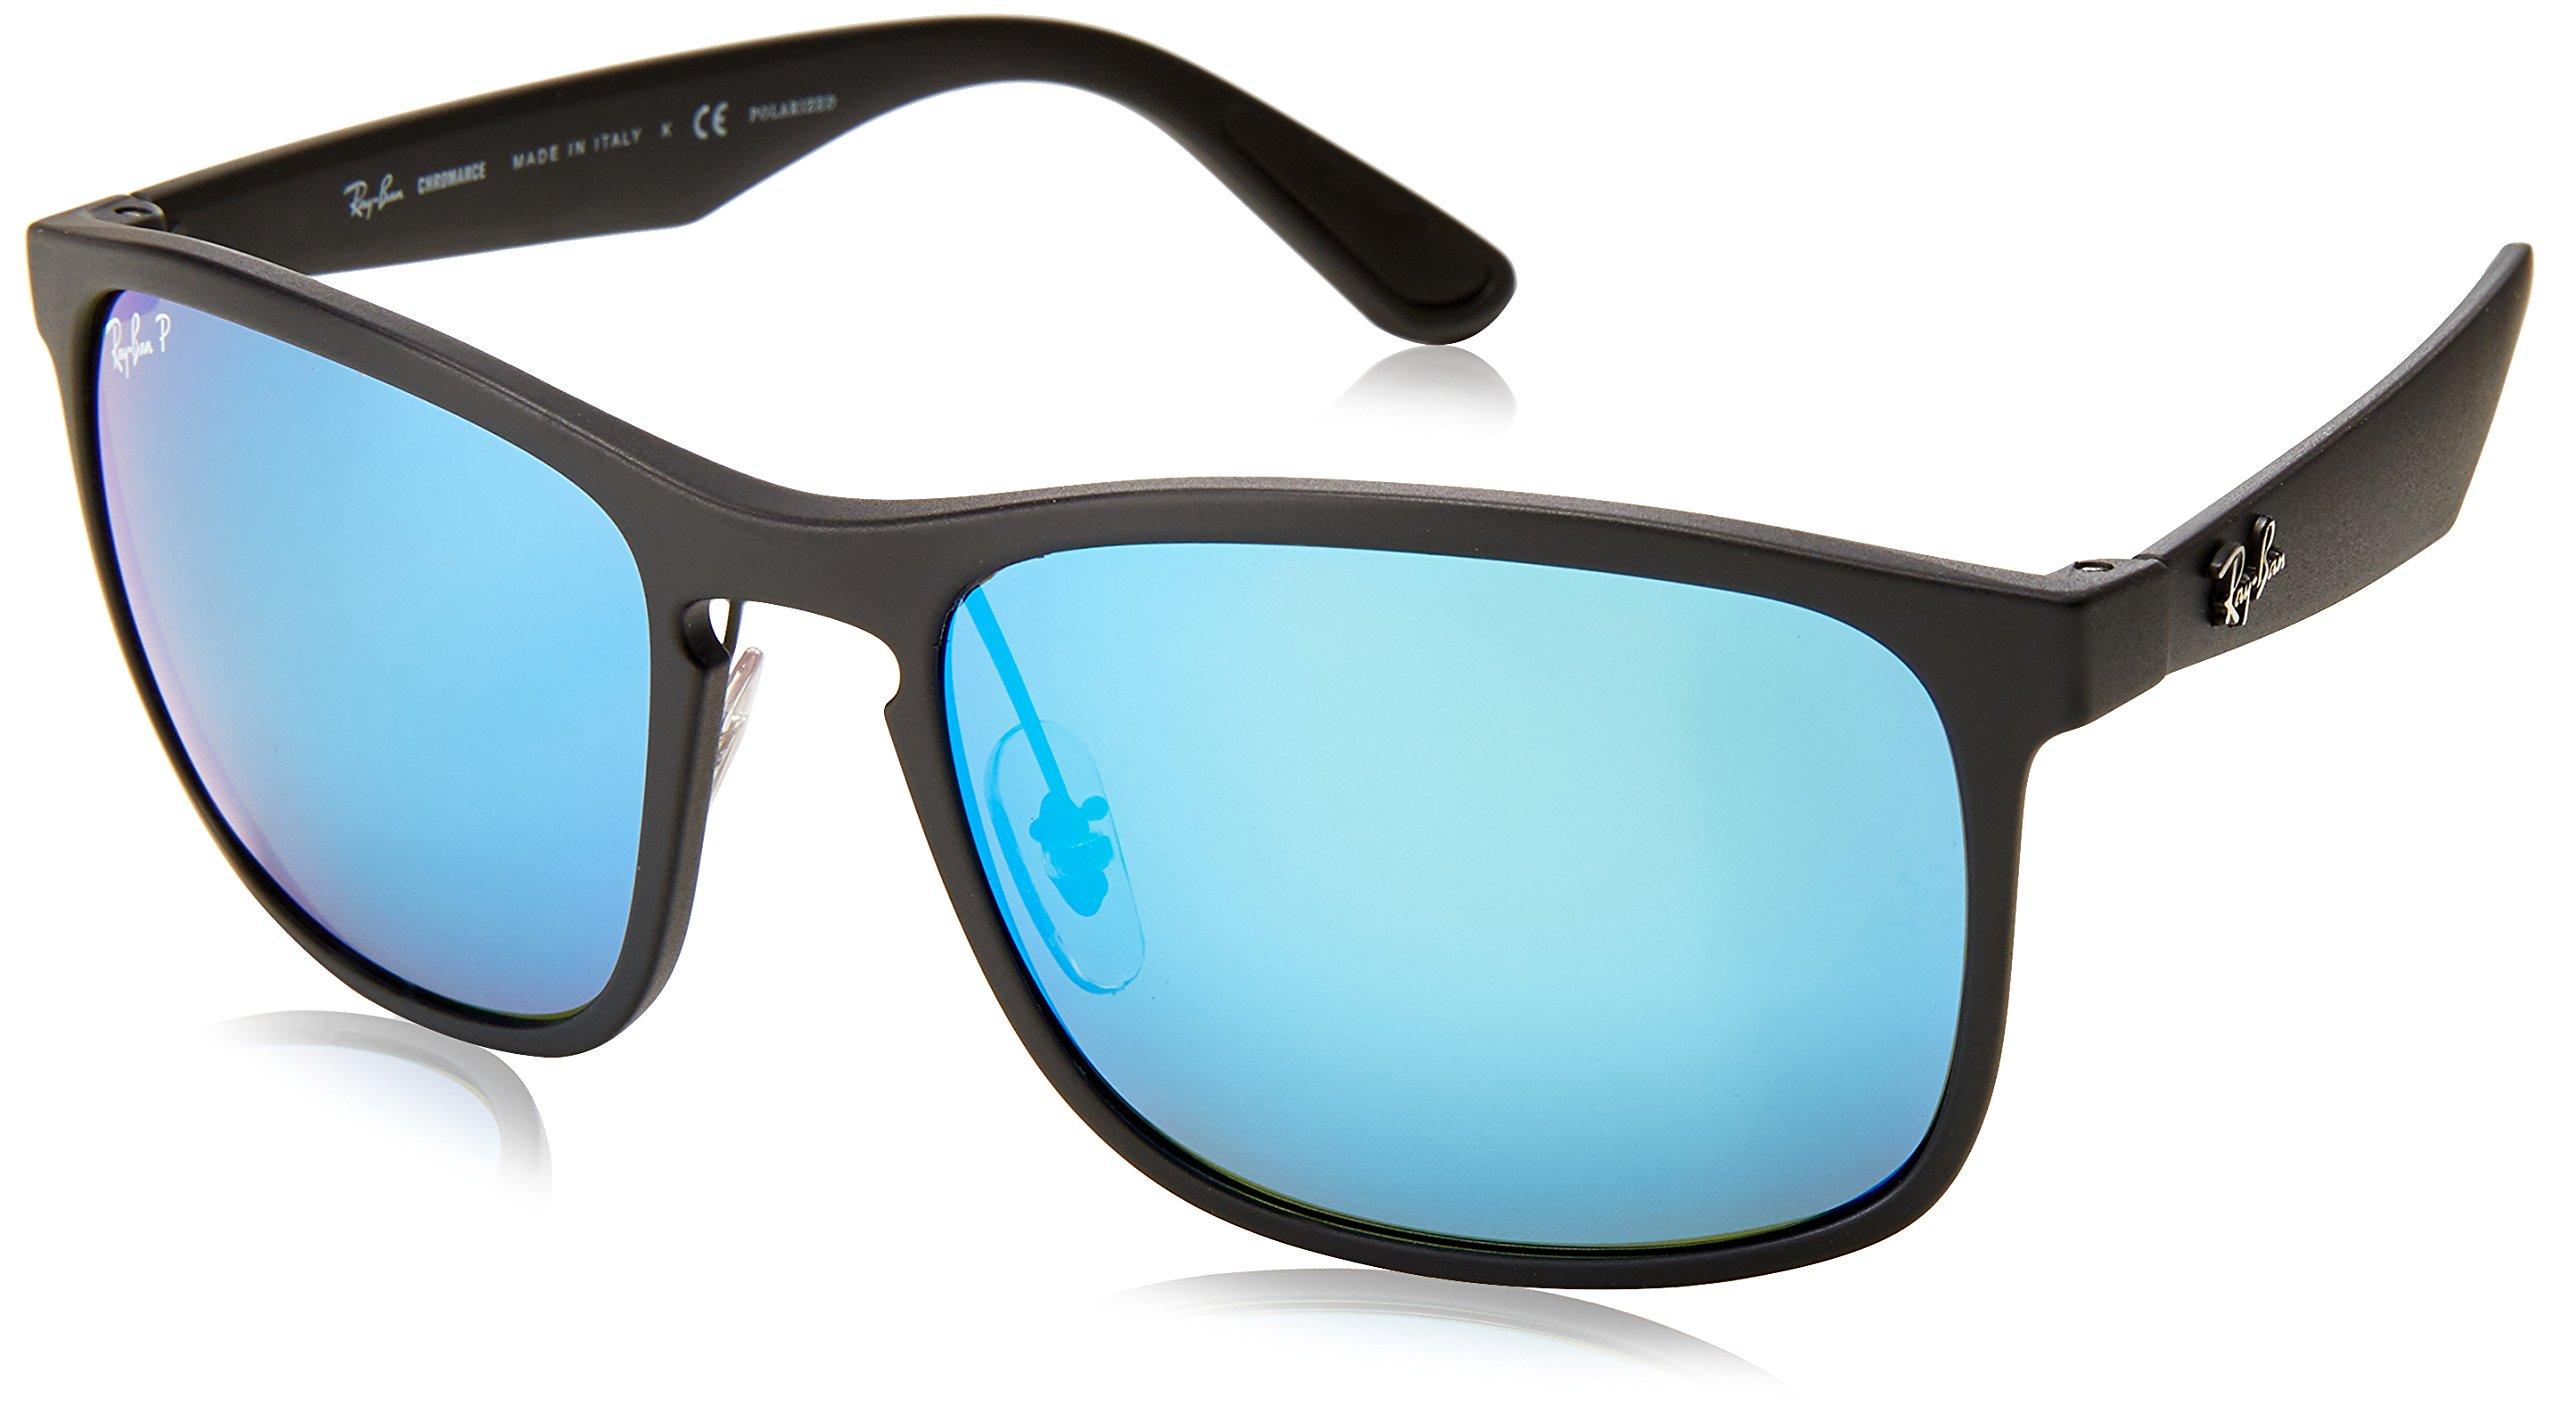 Ray-Ban RB4264 Chromance Lens Square Sunglasses, Black Frame/Blue Mirror Lens (601SA1)/